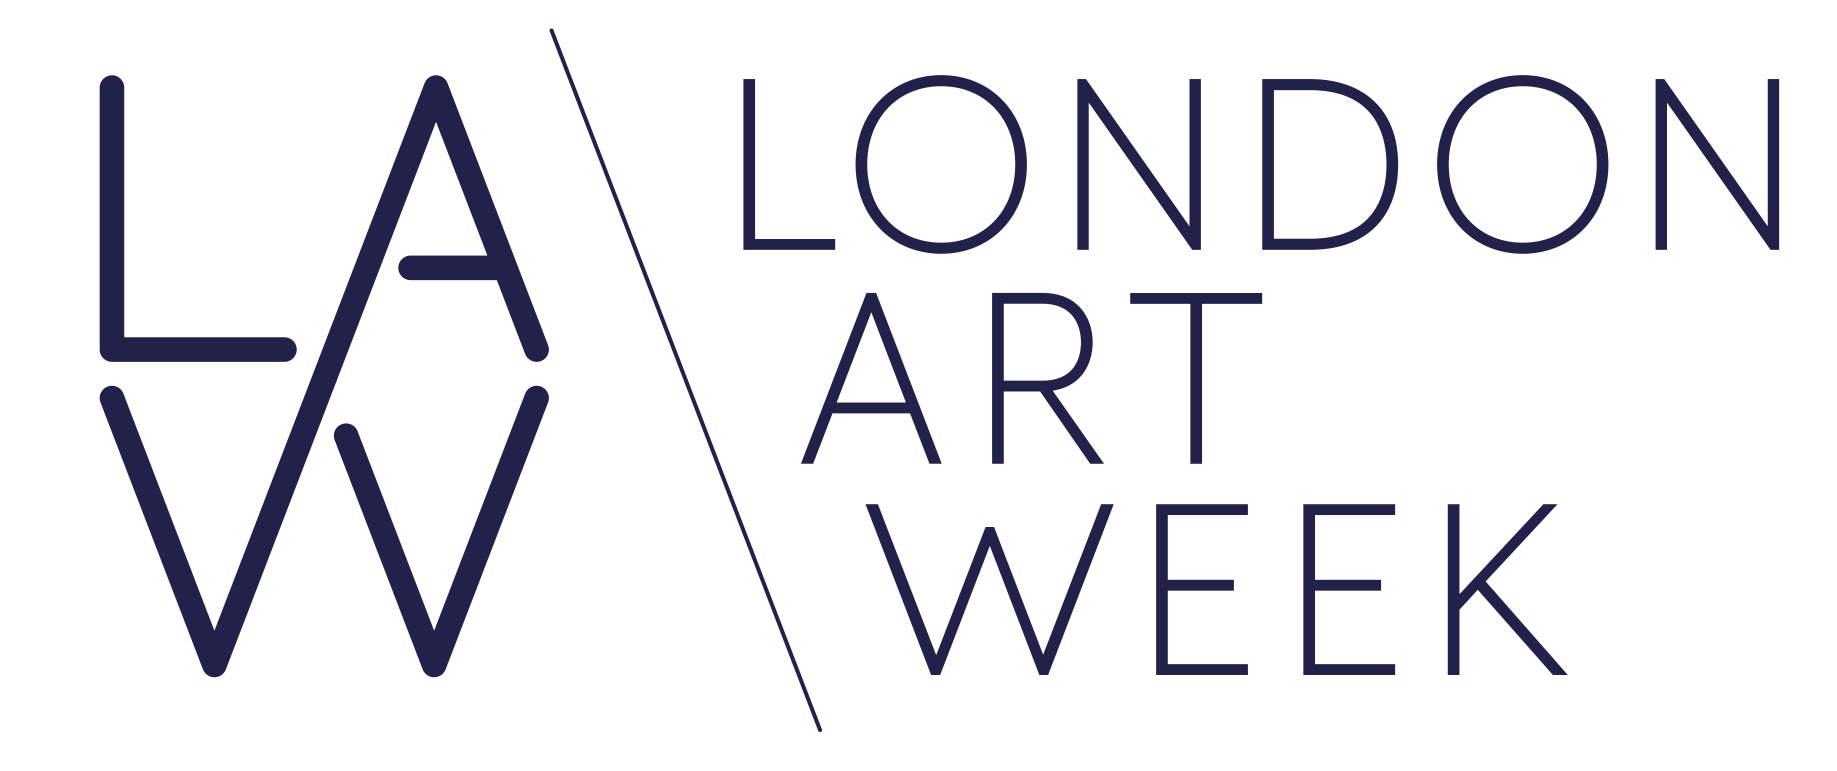 LONDON ART WEEK Fall 2018   November 29th - December 3rd   www.londonartweek.co.uk